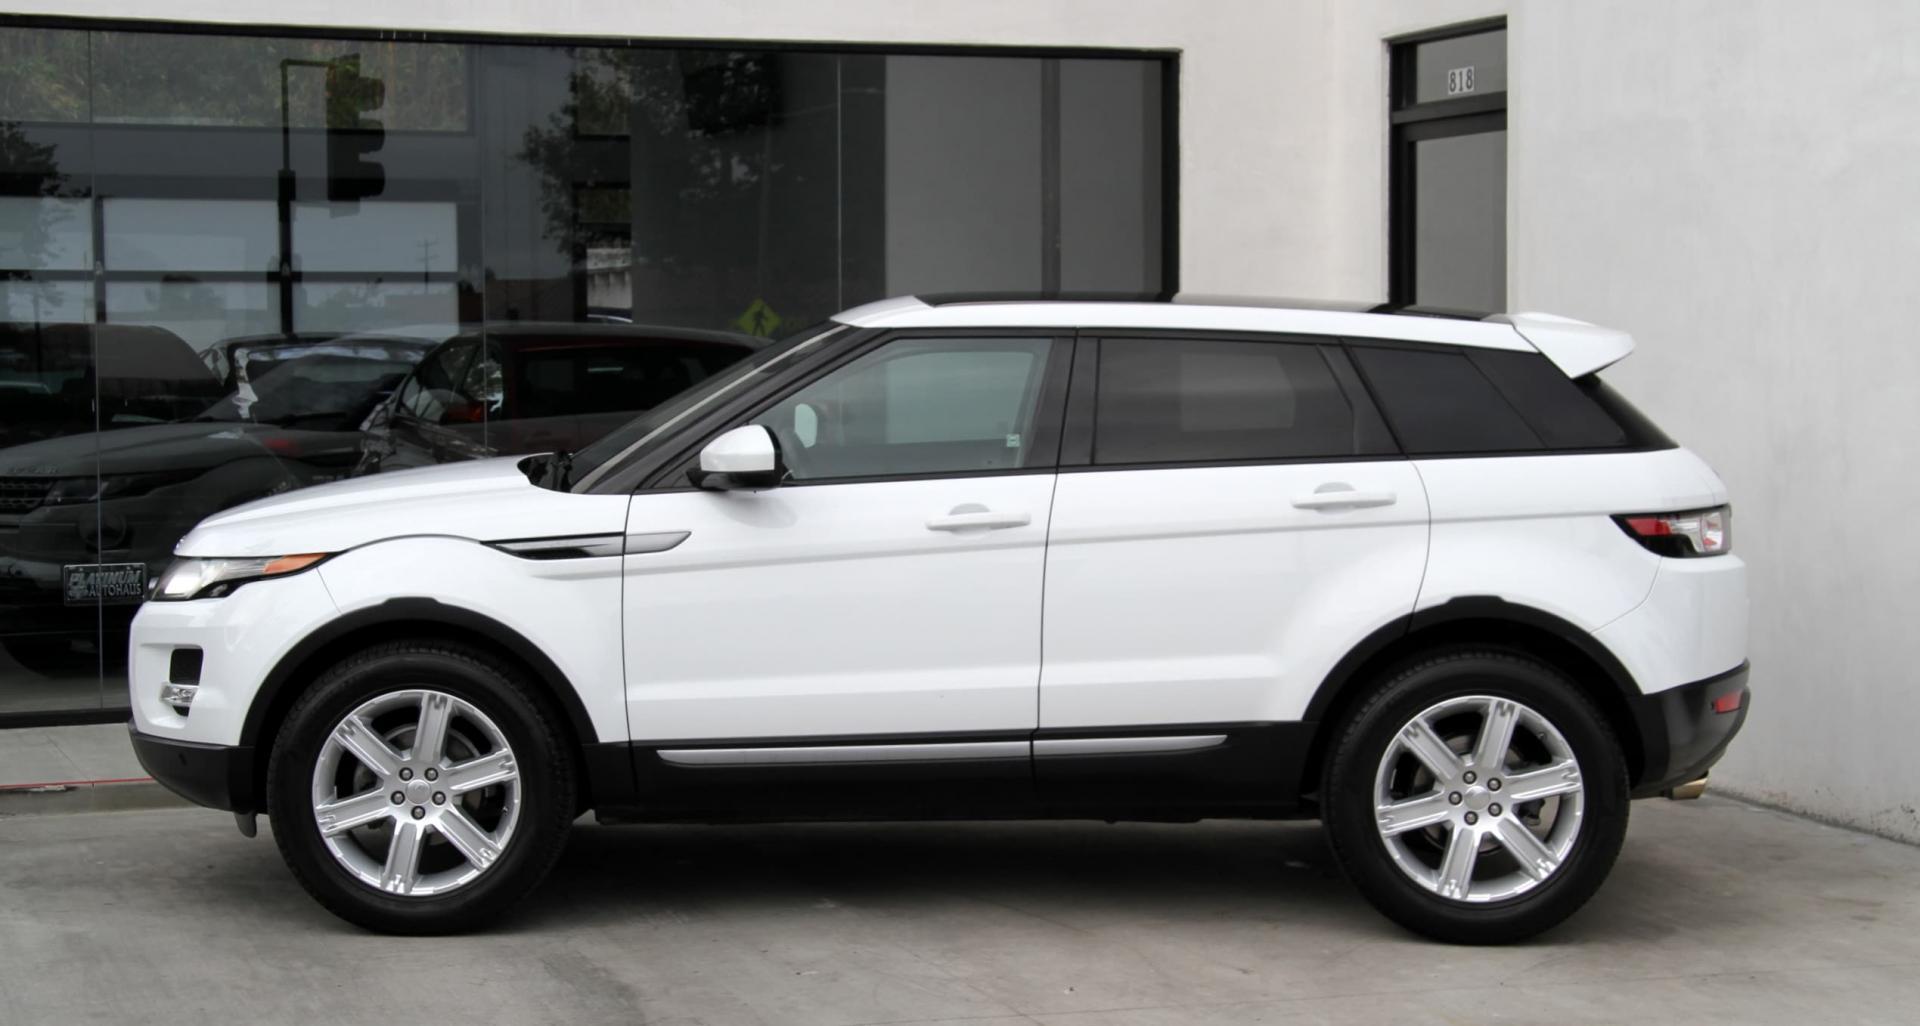 2014 Land Rover Range Rover Evoque PURE PLUS Stock 5881 for sale